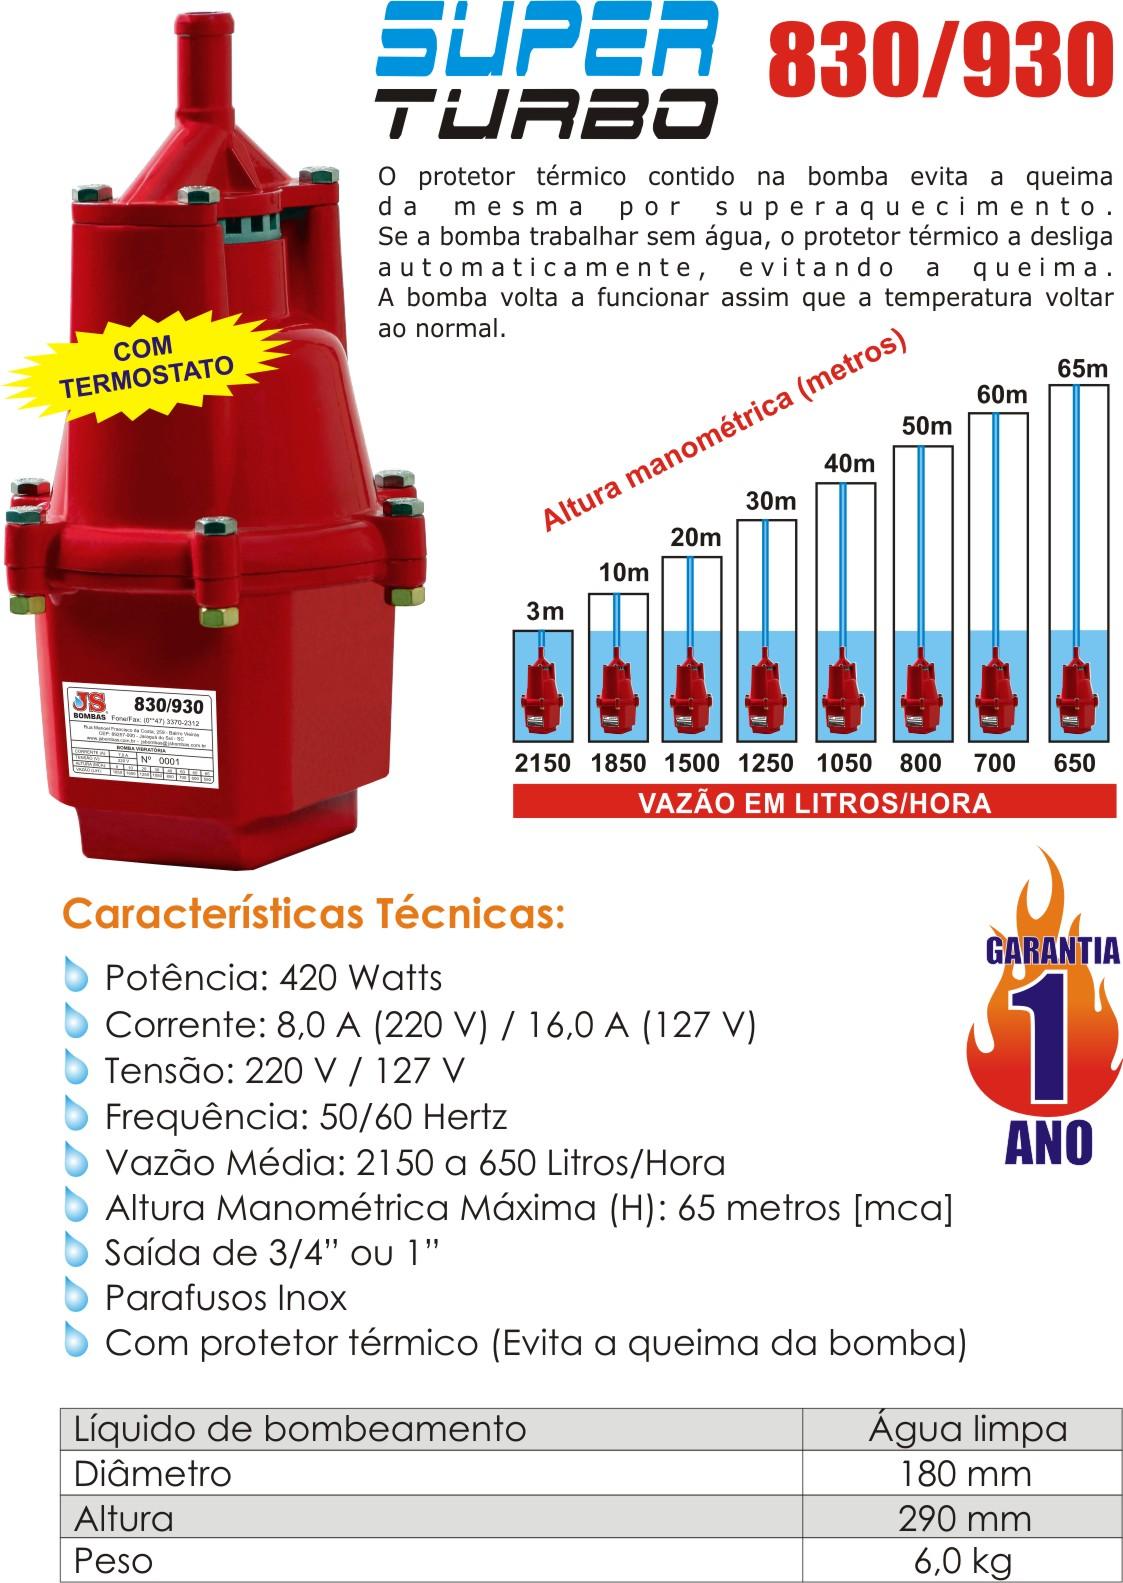 830/930 Super Turbo